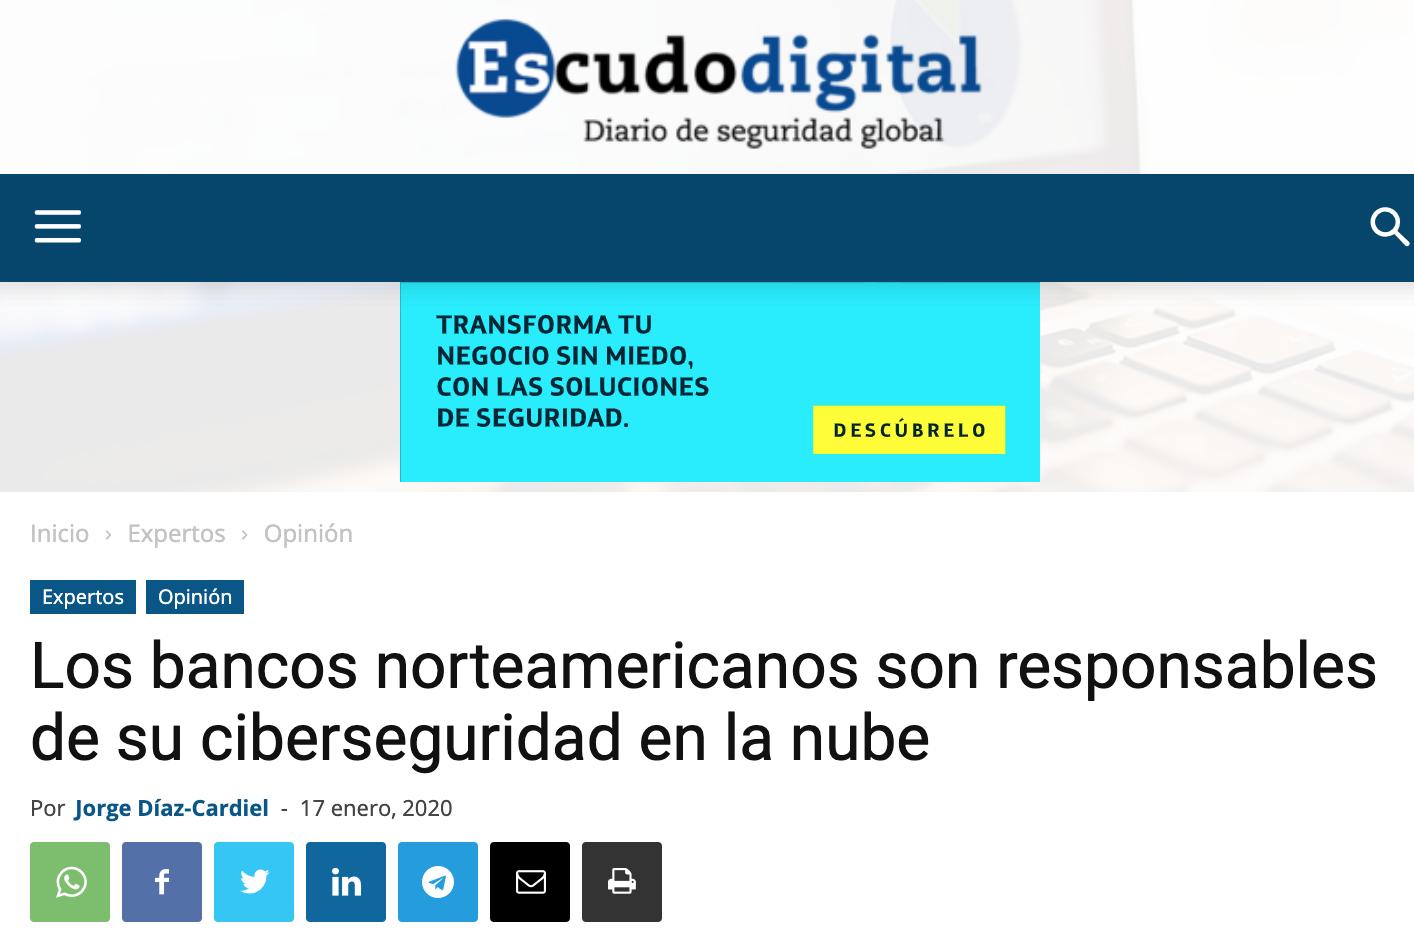 Article by Jorge Díaz-Cardiel in Escudo Digital